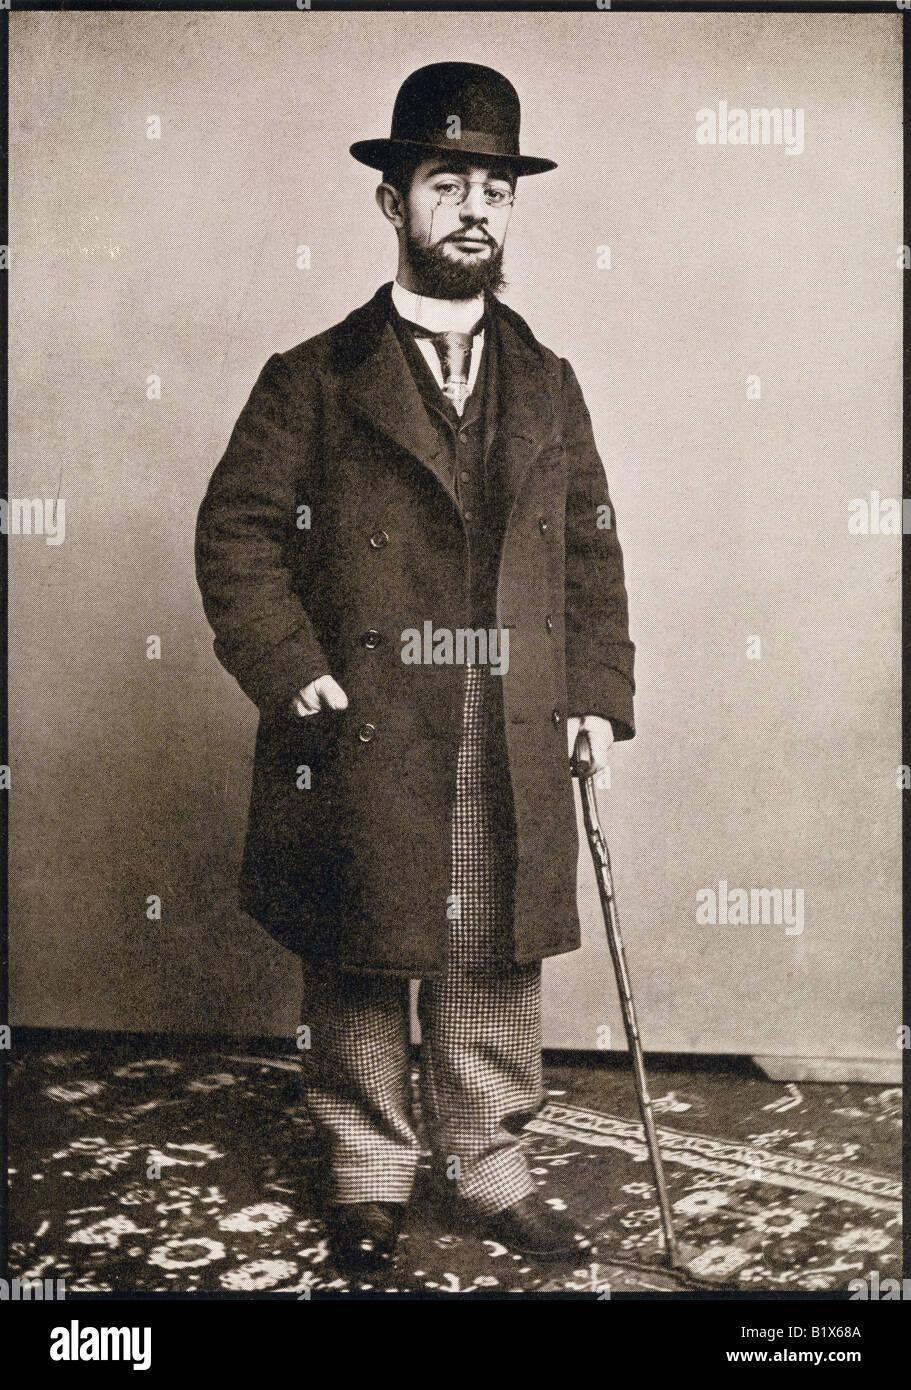 Henri Marie Raymond de Toulouse-Lautrec Monfa, 1864 - 1901. Französischer Maler, Grafiker, Zeichner und Illustrator. Stockbild